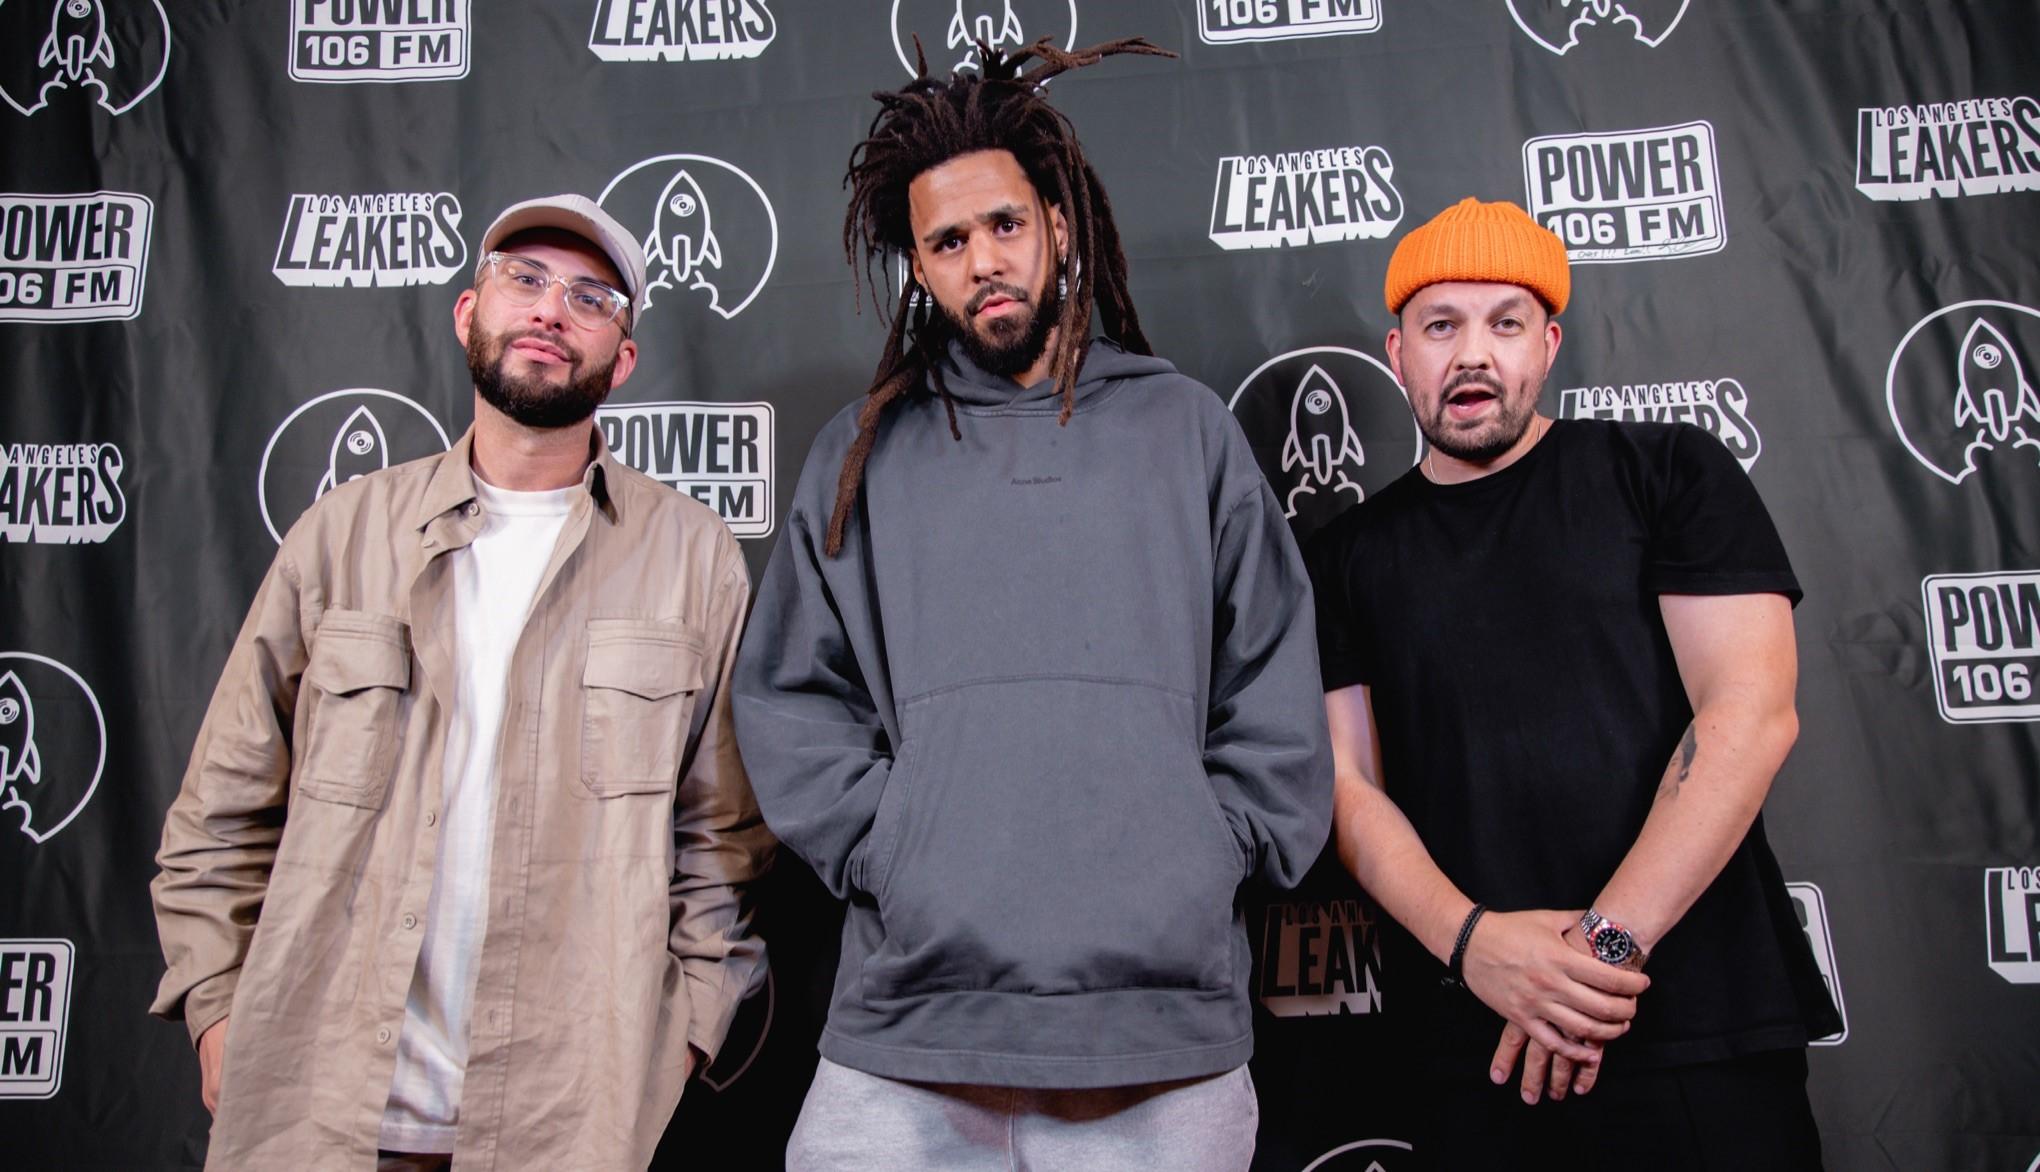 Justin Credible, J. Cole, and DJ Sourmilk